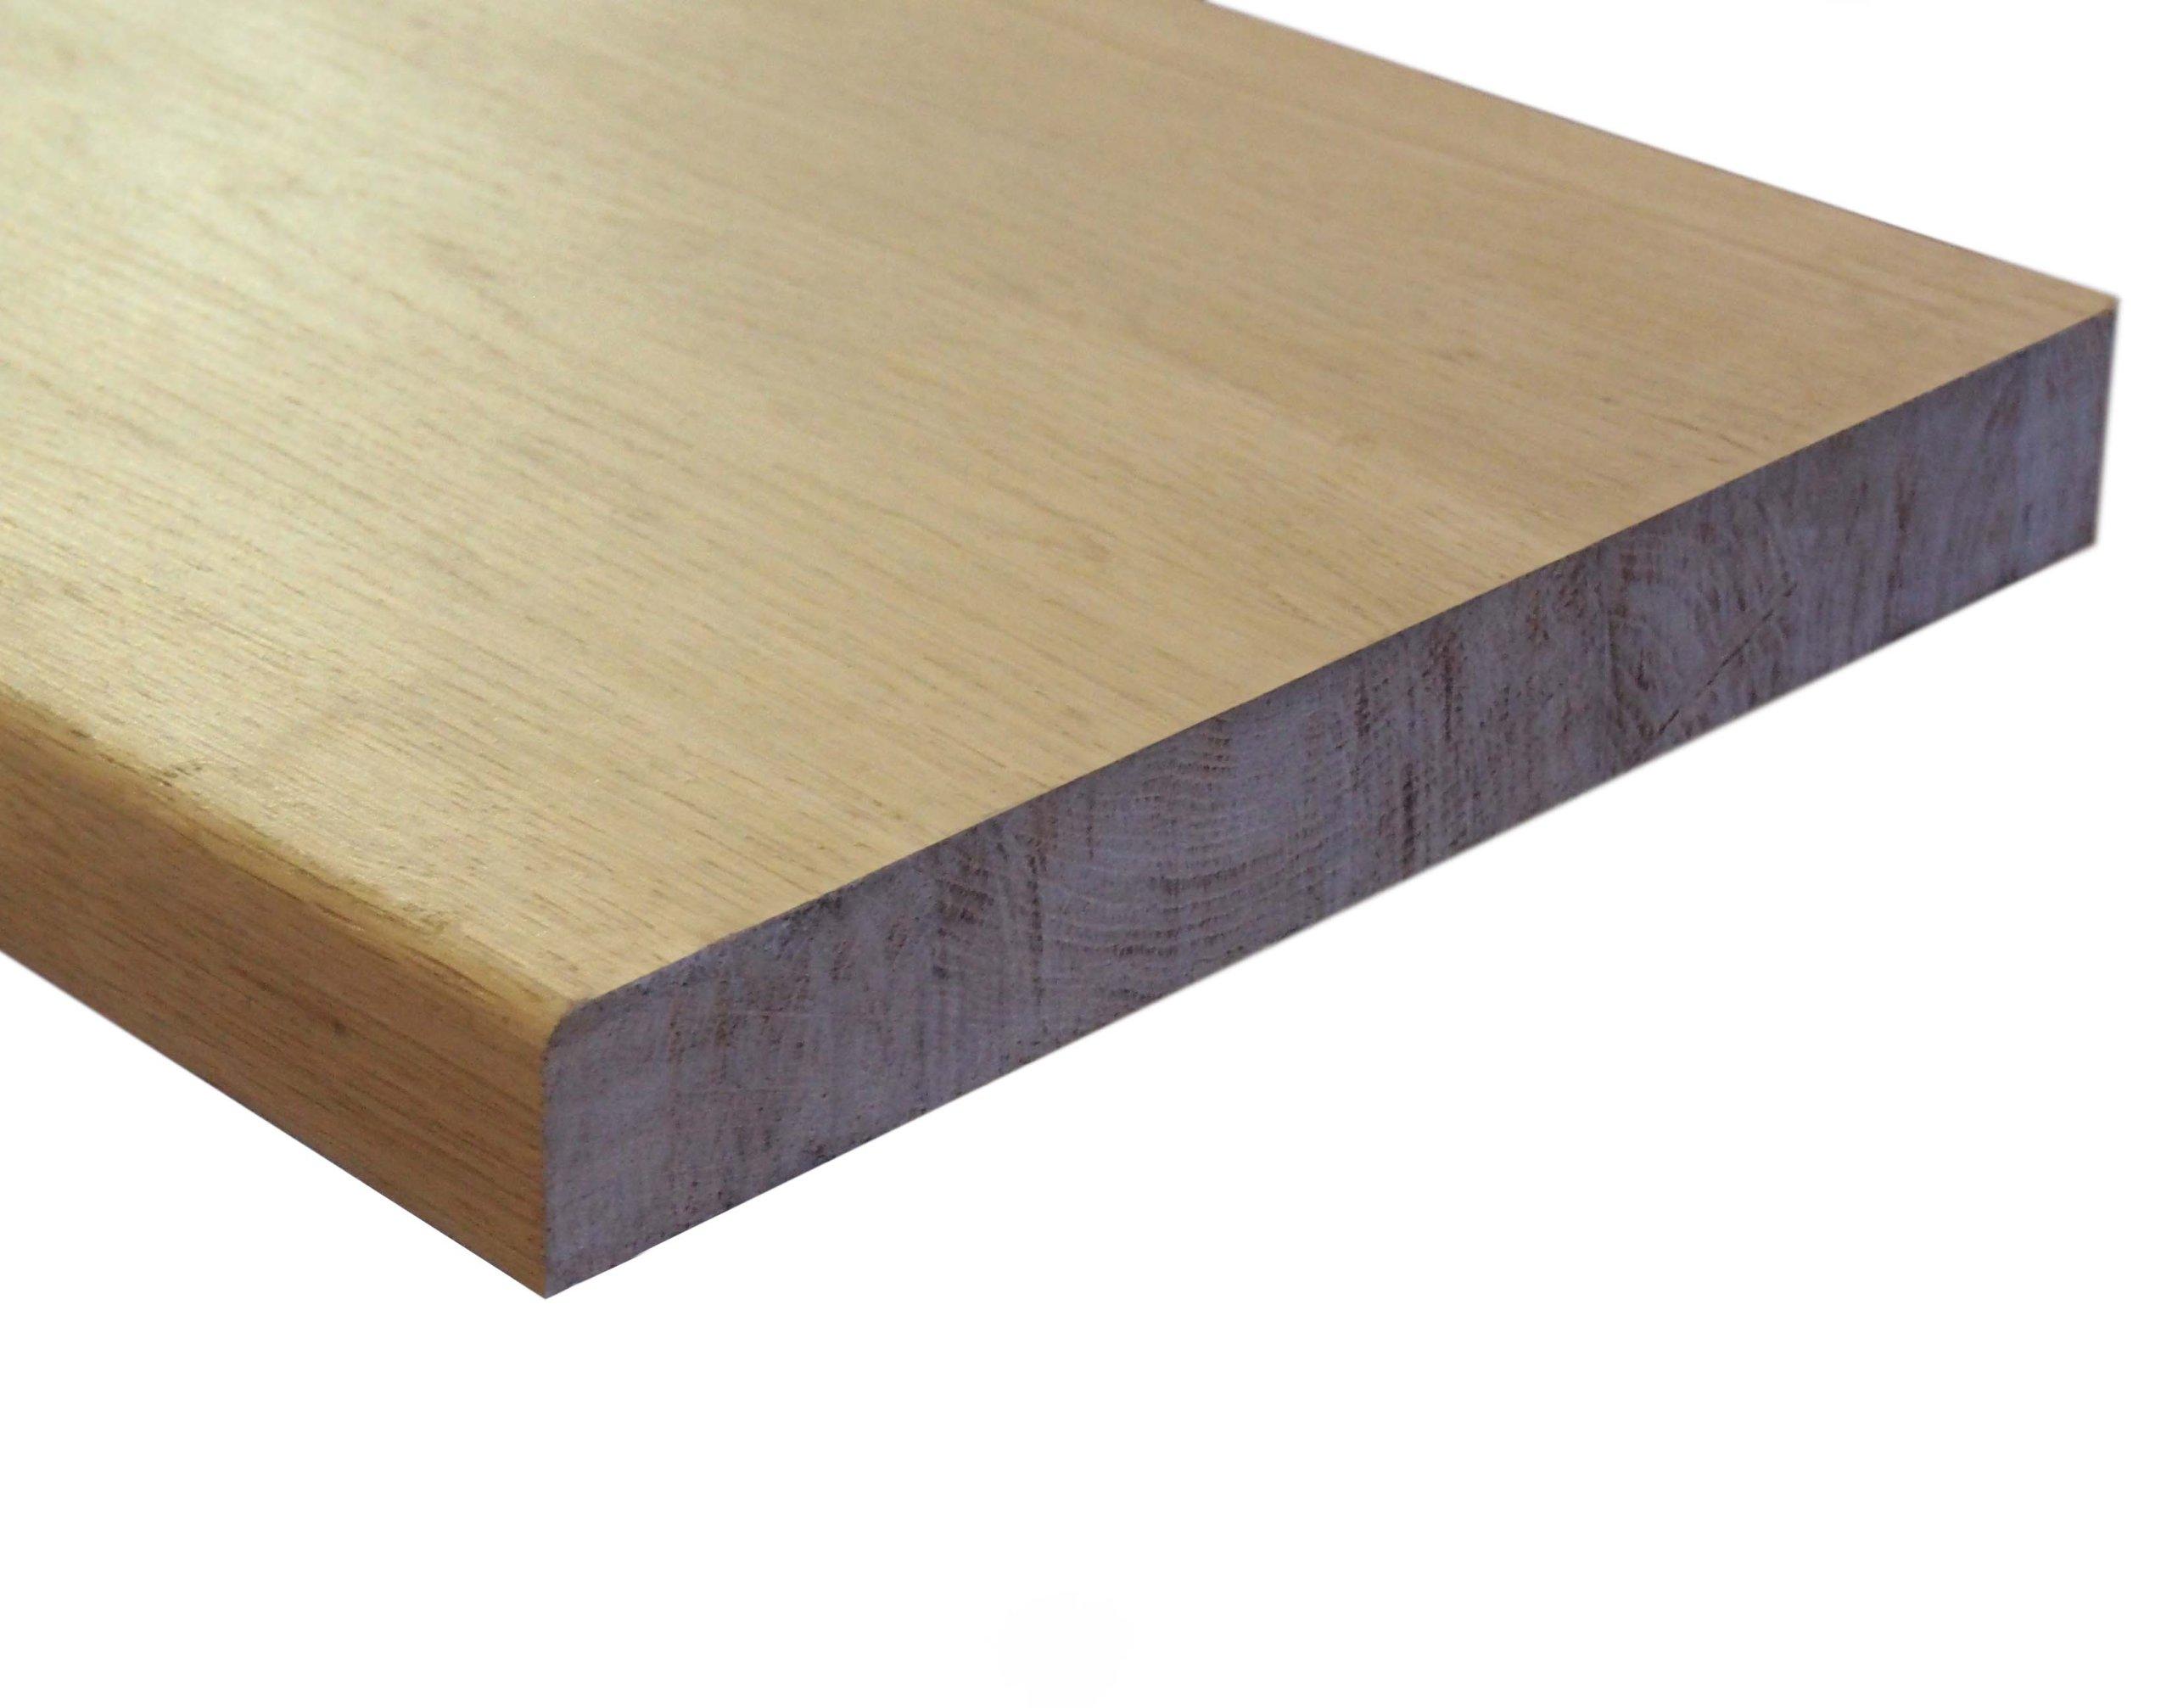 Doska DUB 60x150 cm g 4 cm tanier